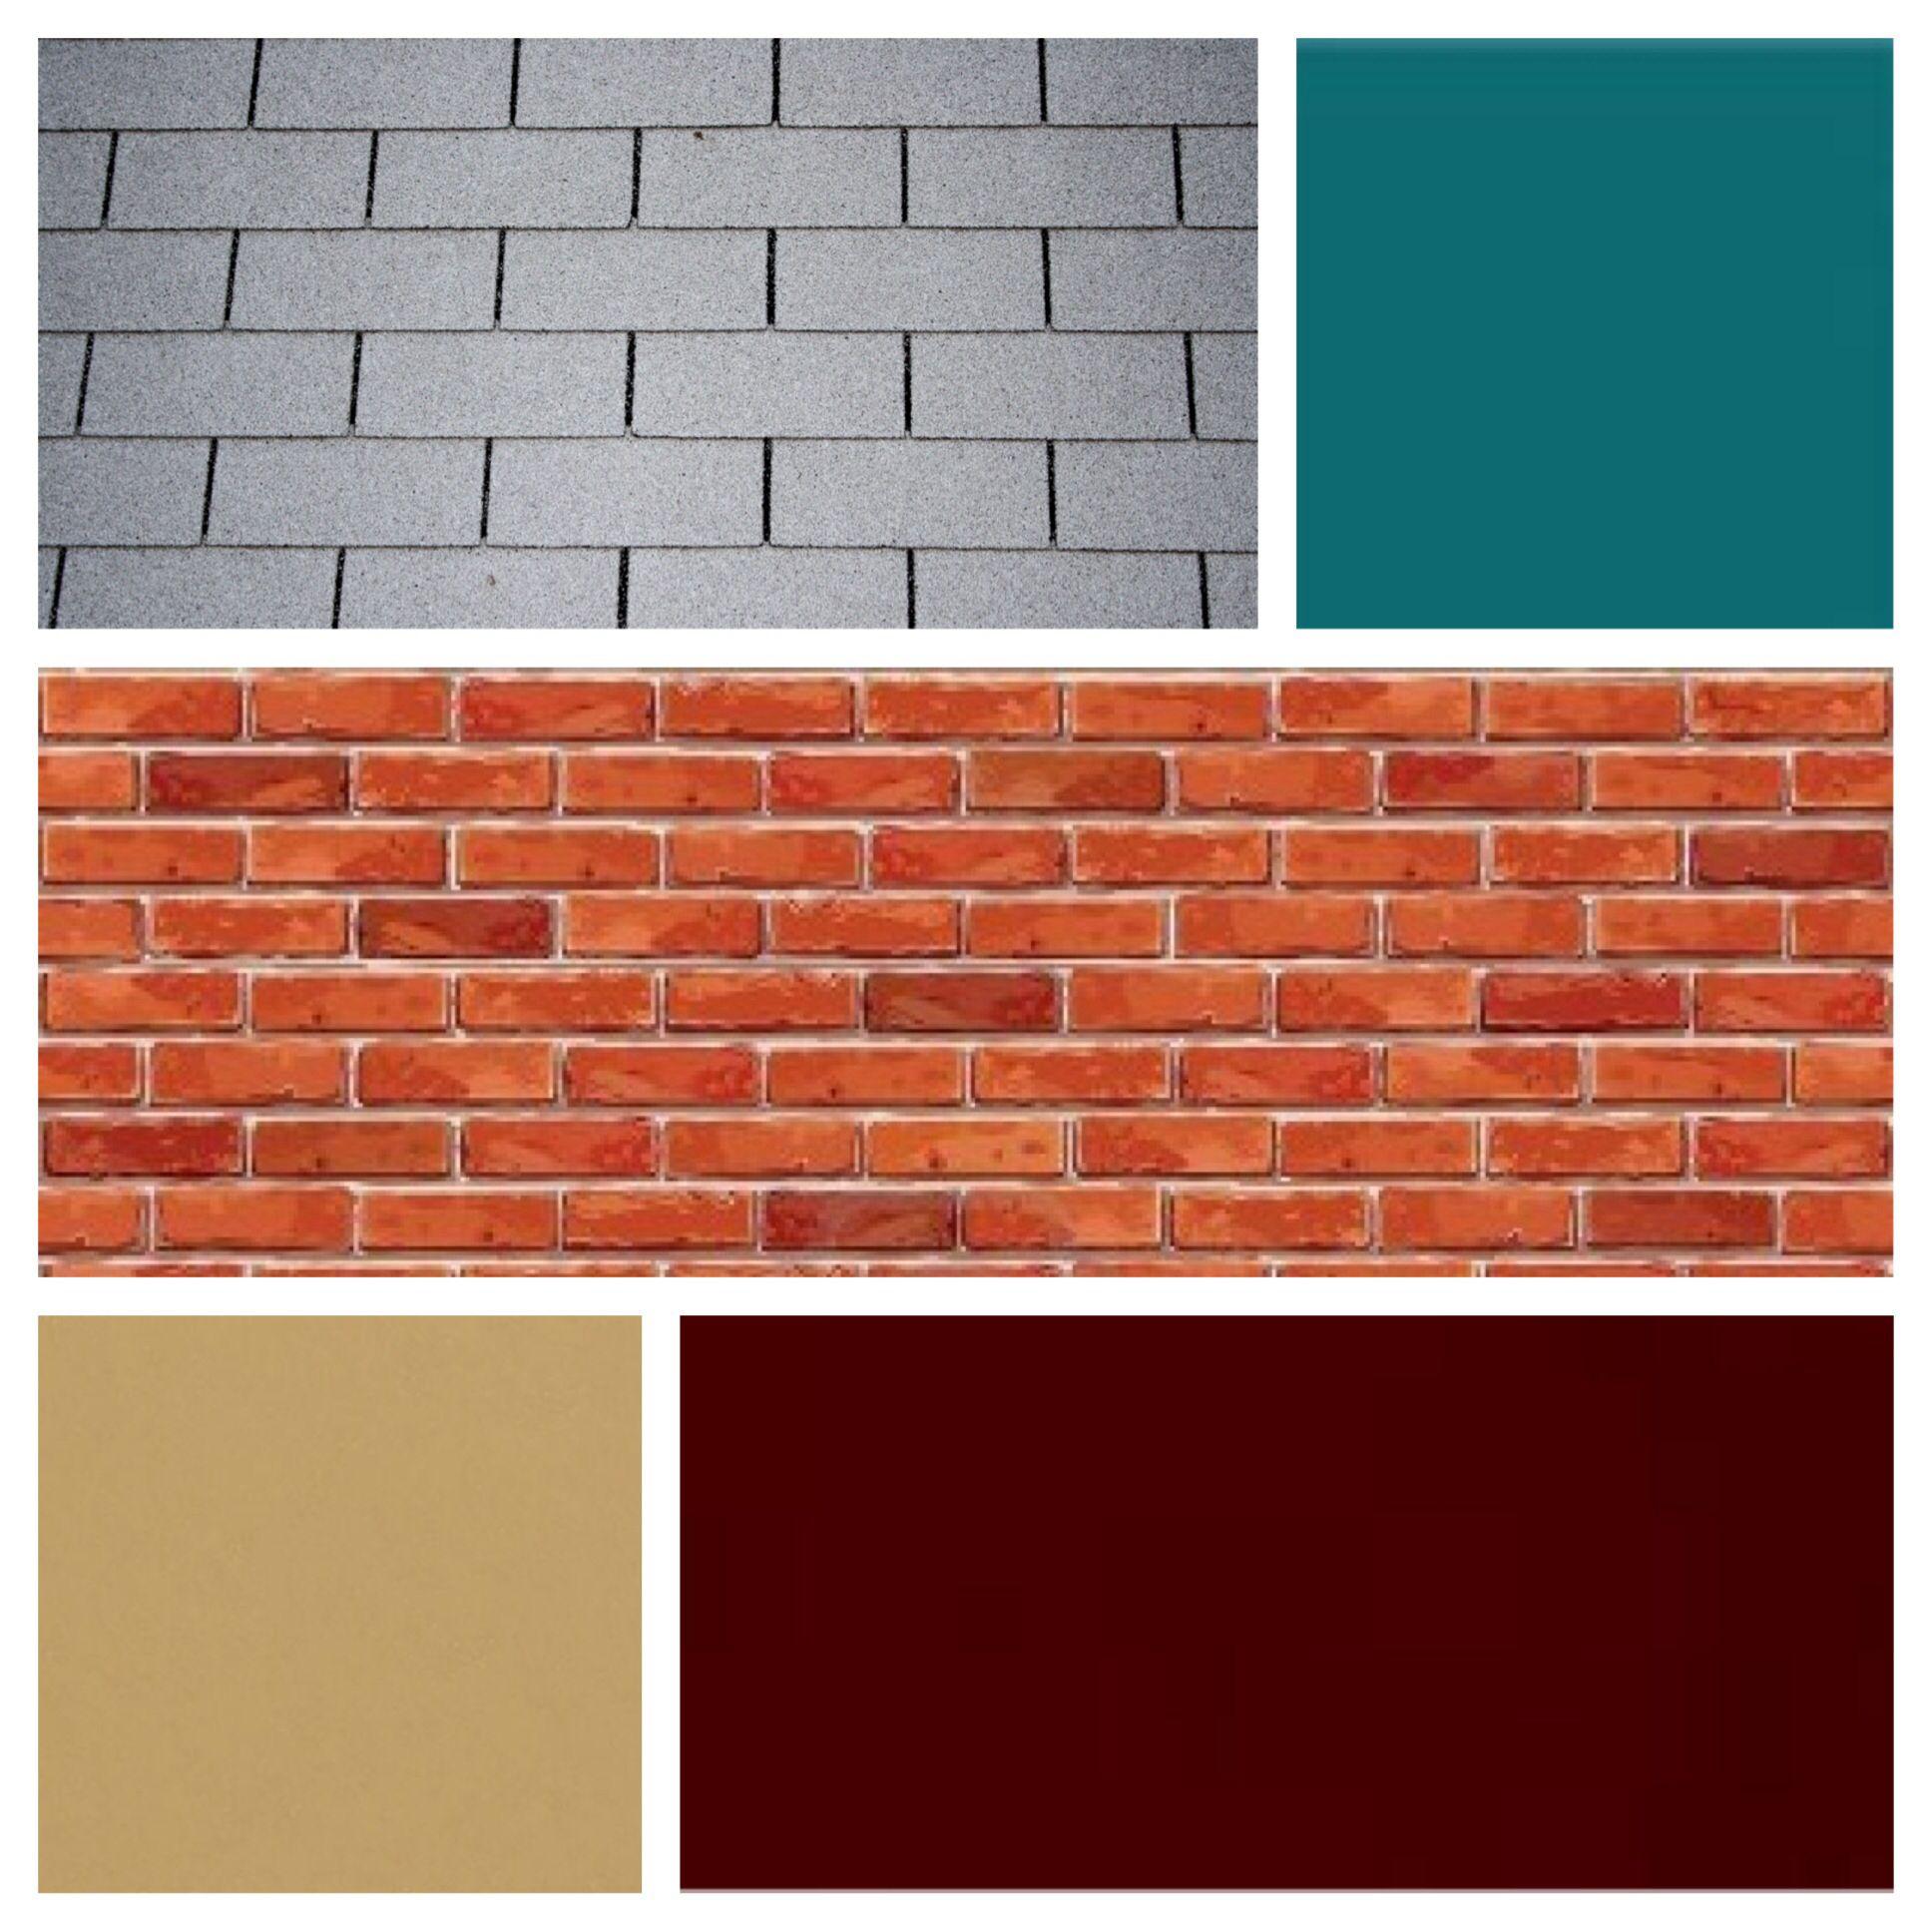 Exterior color scheme for red brick and grey roof burgundy door